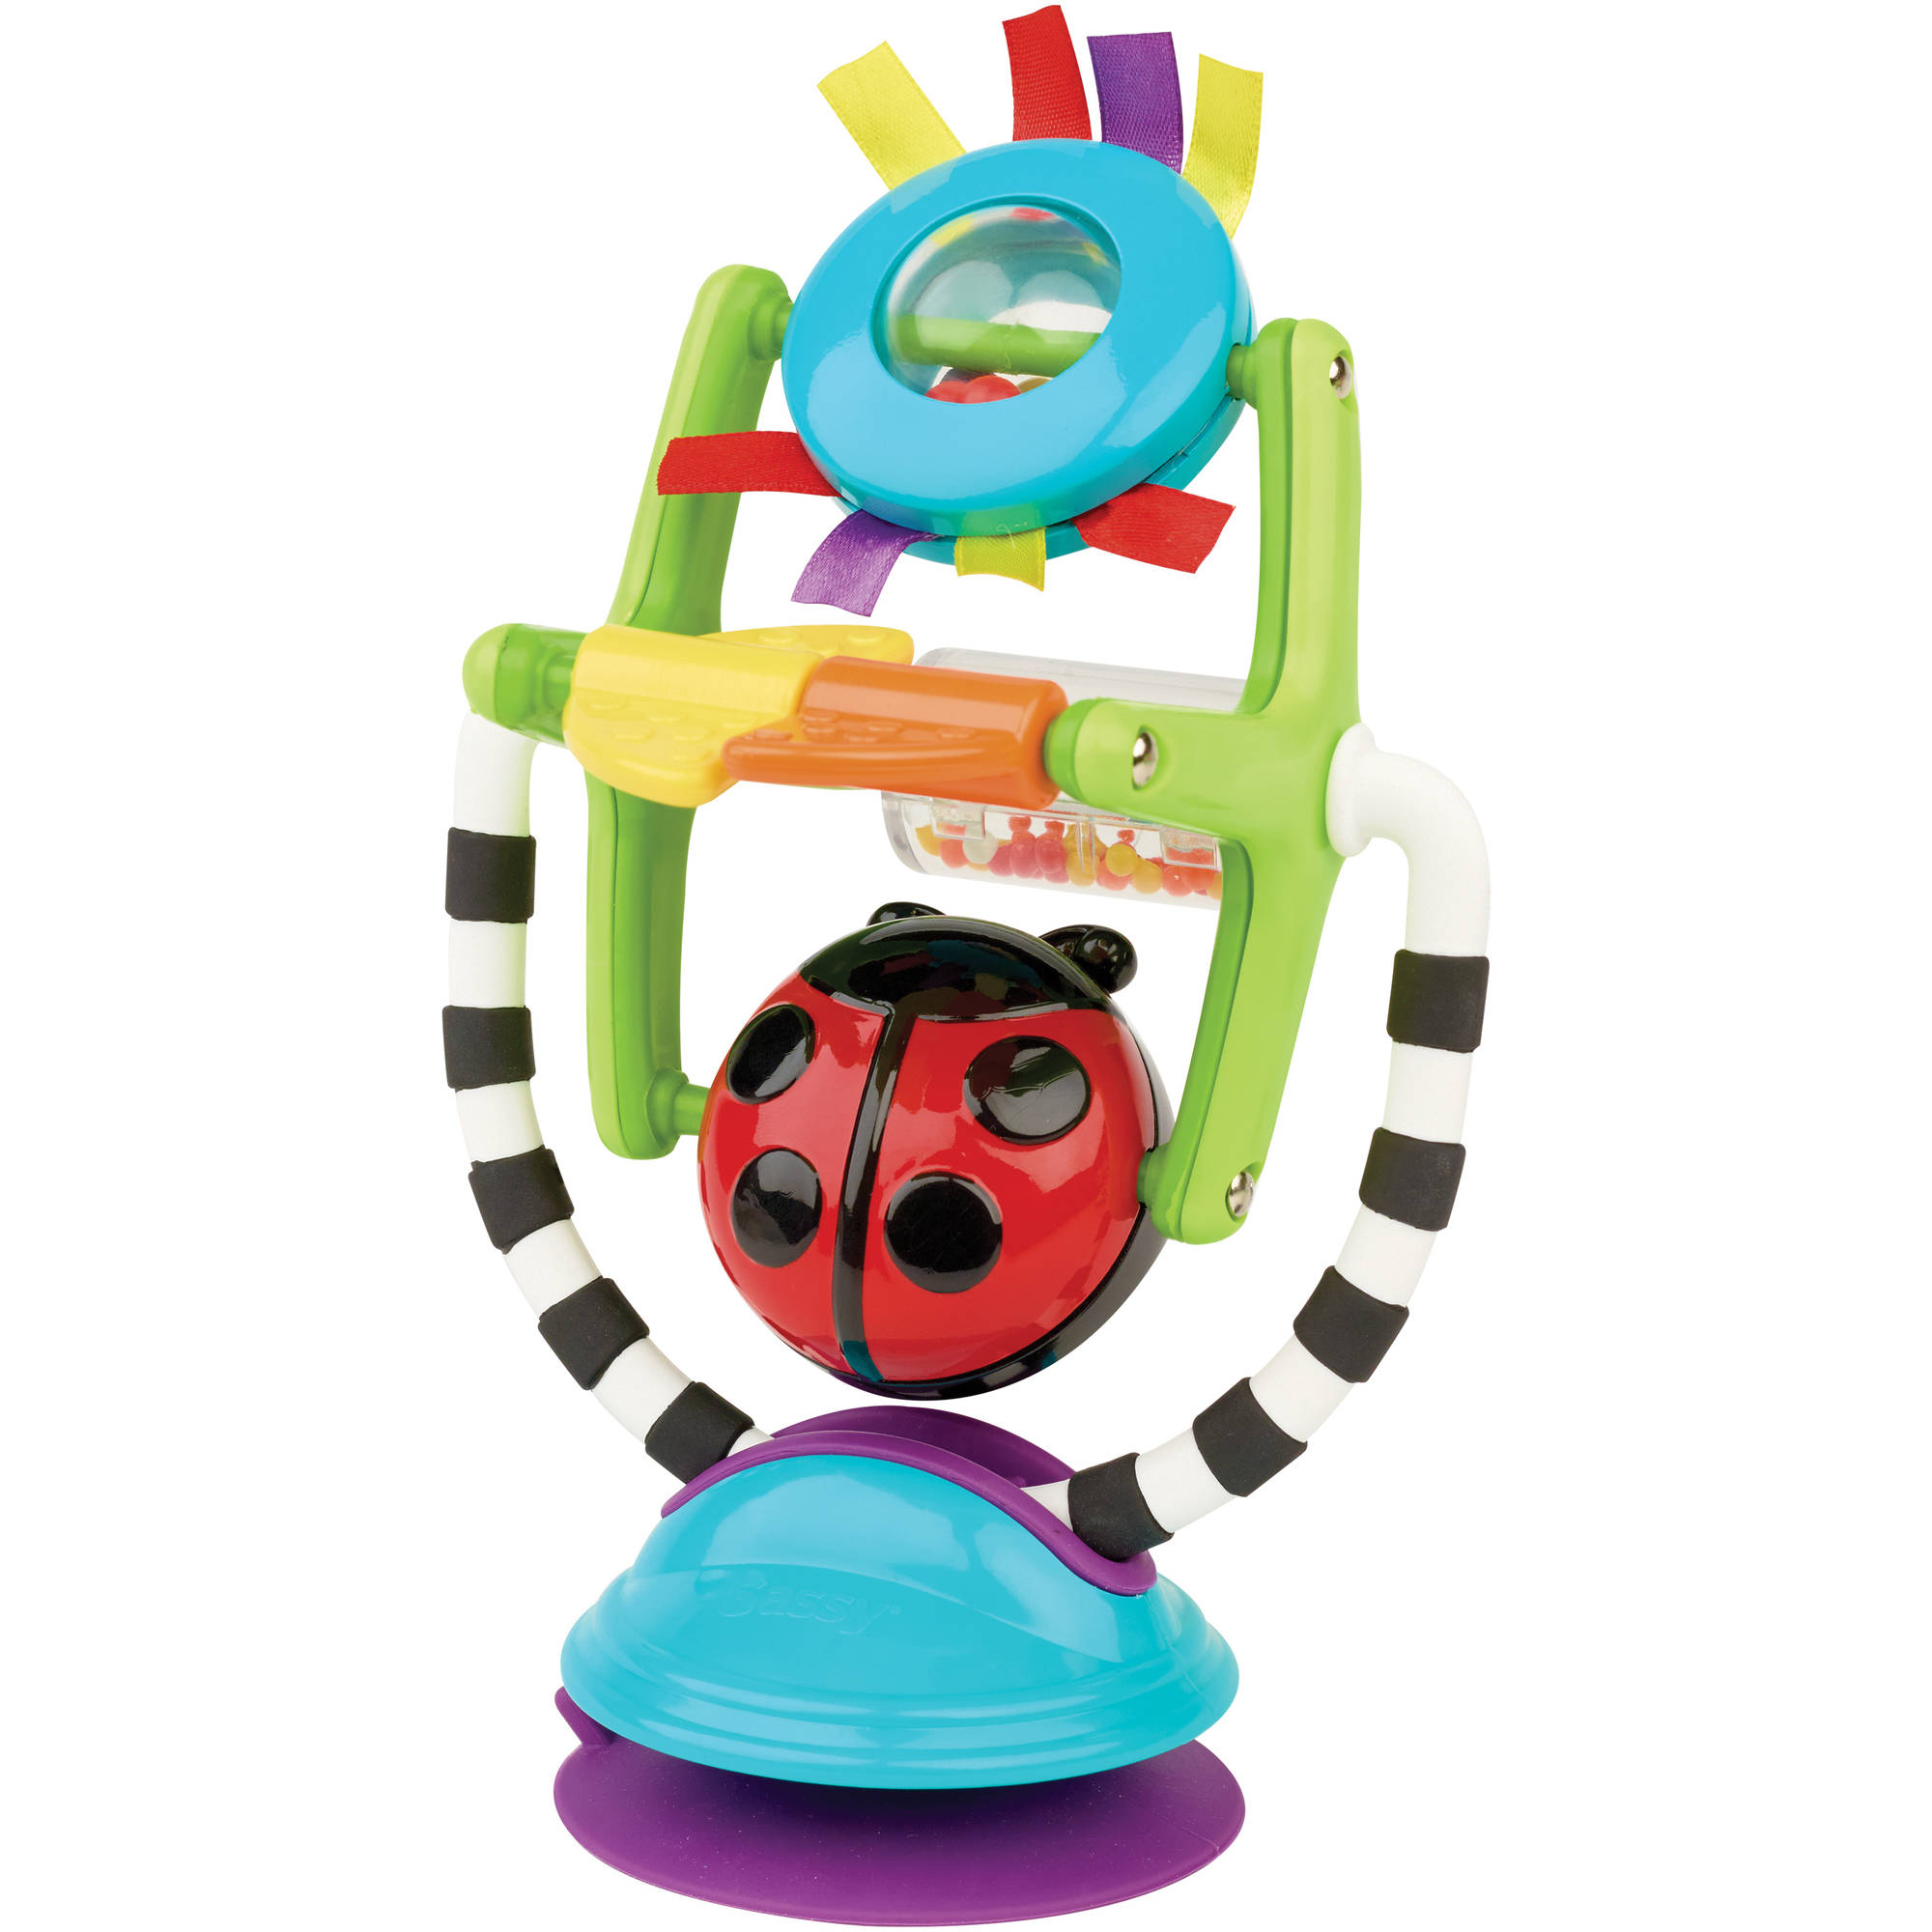 Sassy Baby S Sensation Station High Chair Toy Walmart Com